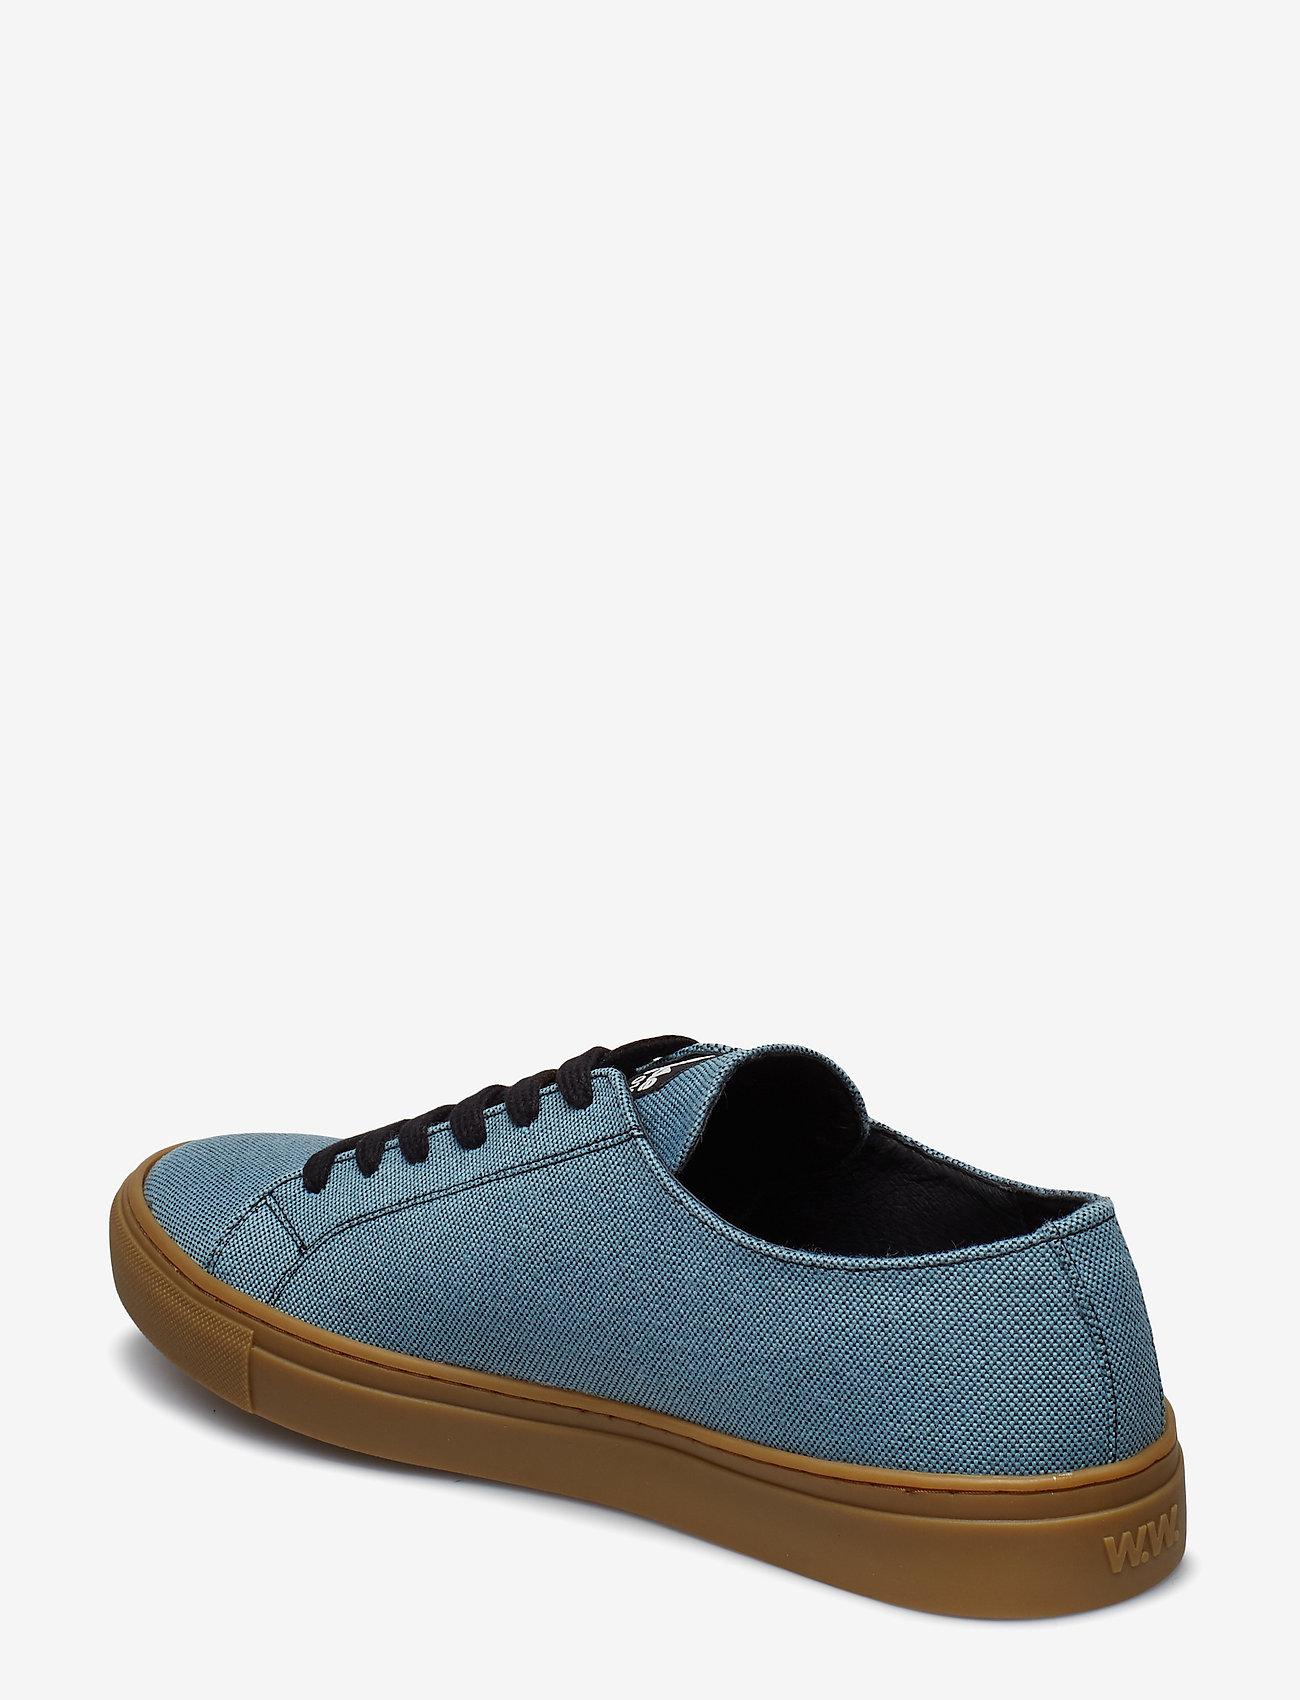 Wood Wood - Alex shoe - låga sneakers - blue - 2